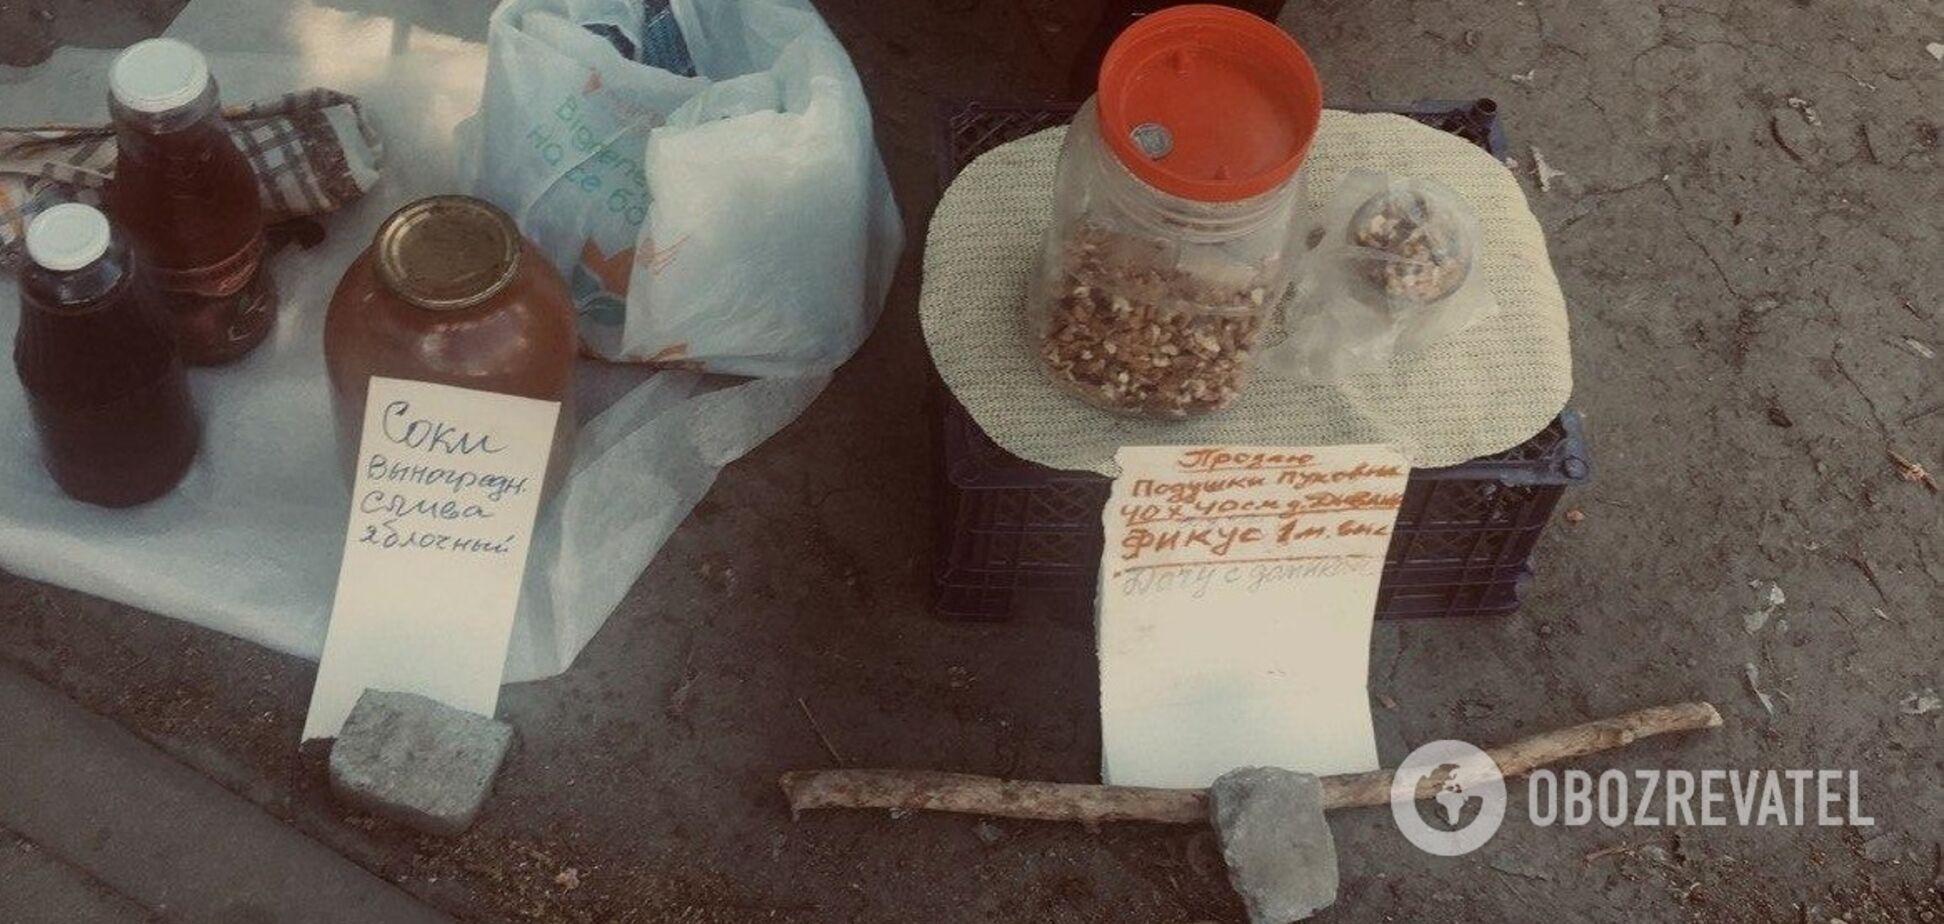 Сдают картон и собирают бутылки: как выживают пенсионеры Днепра во время карантина